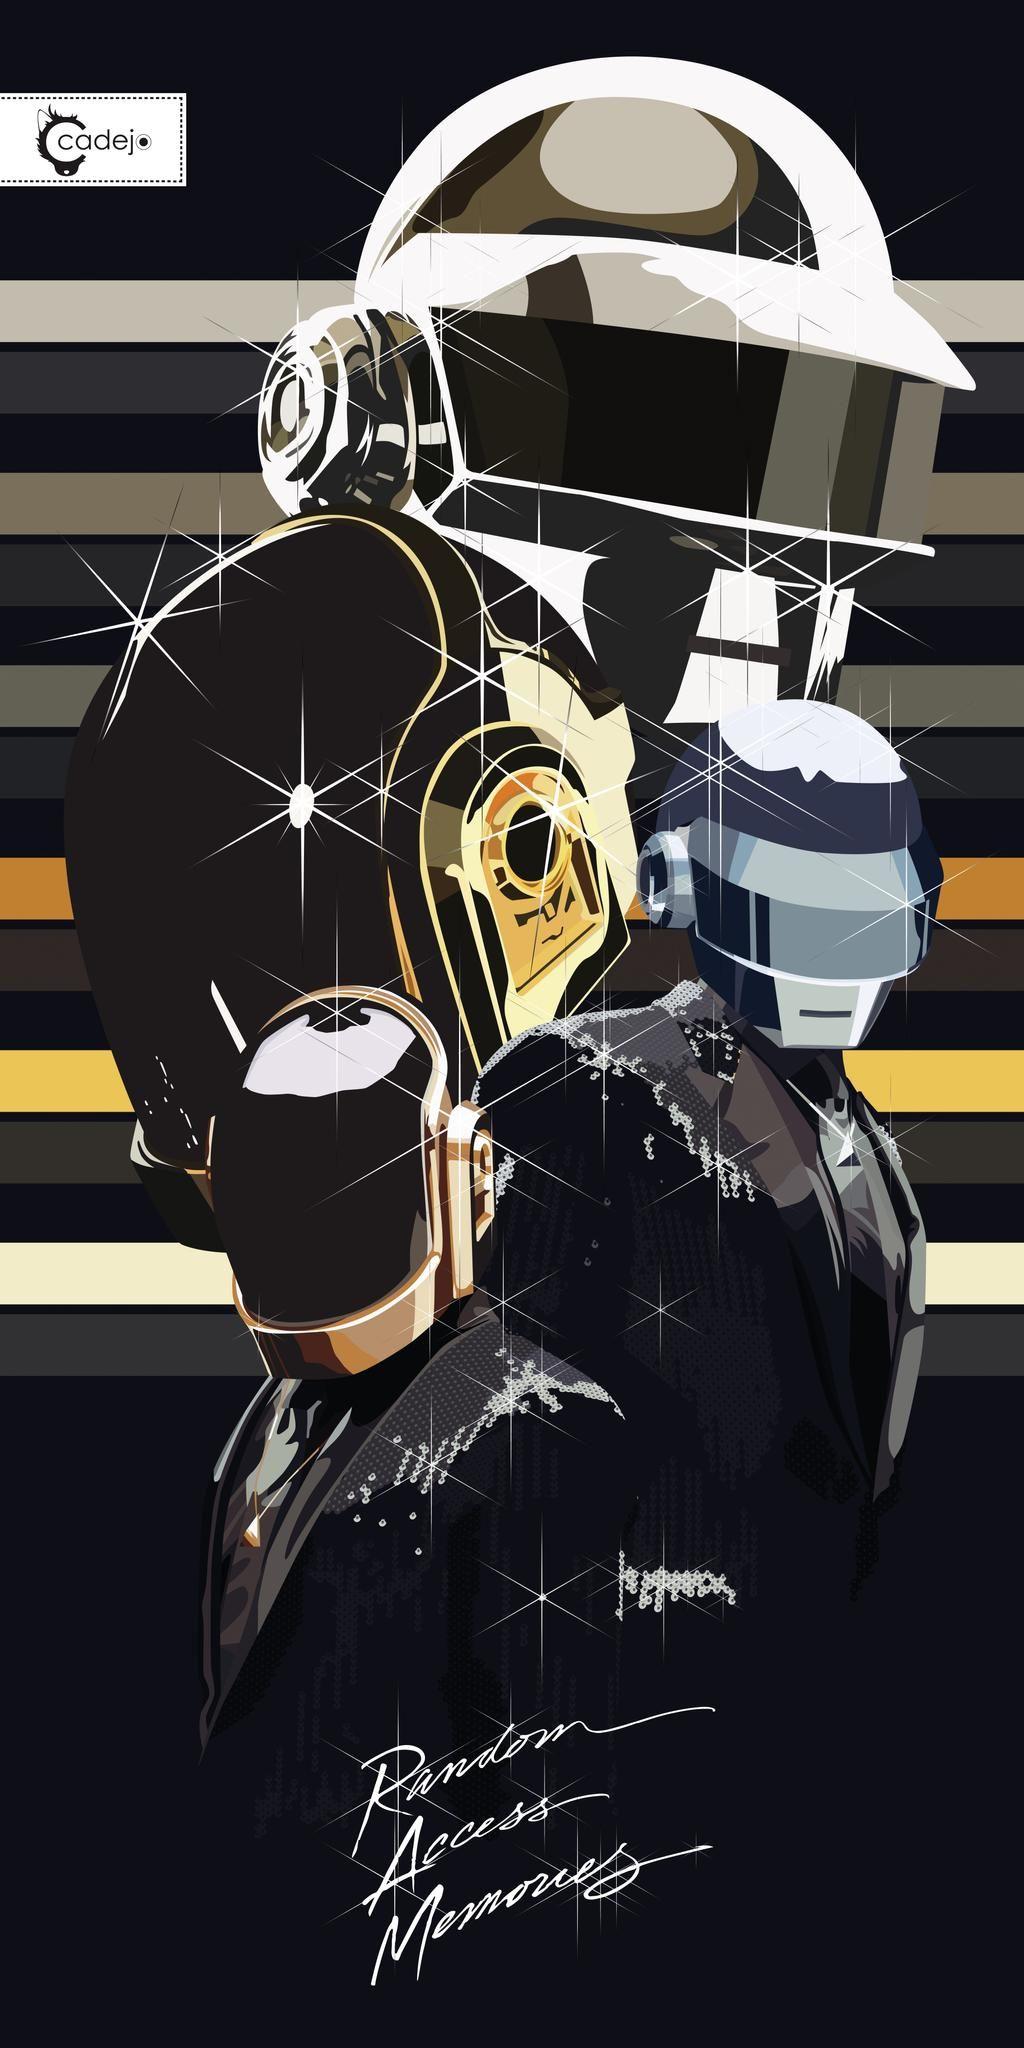 Daft Punk RAM by elcadejoblanco on DeviantArt in 2020